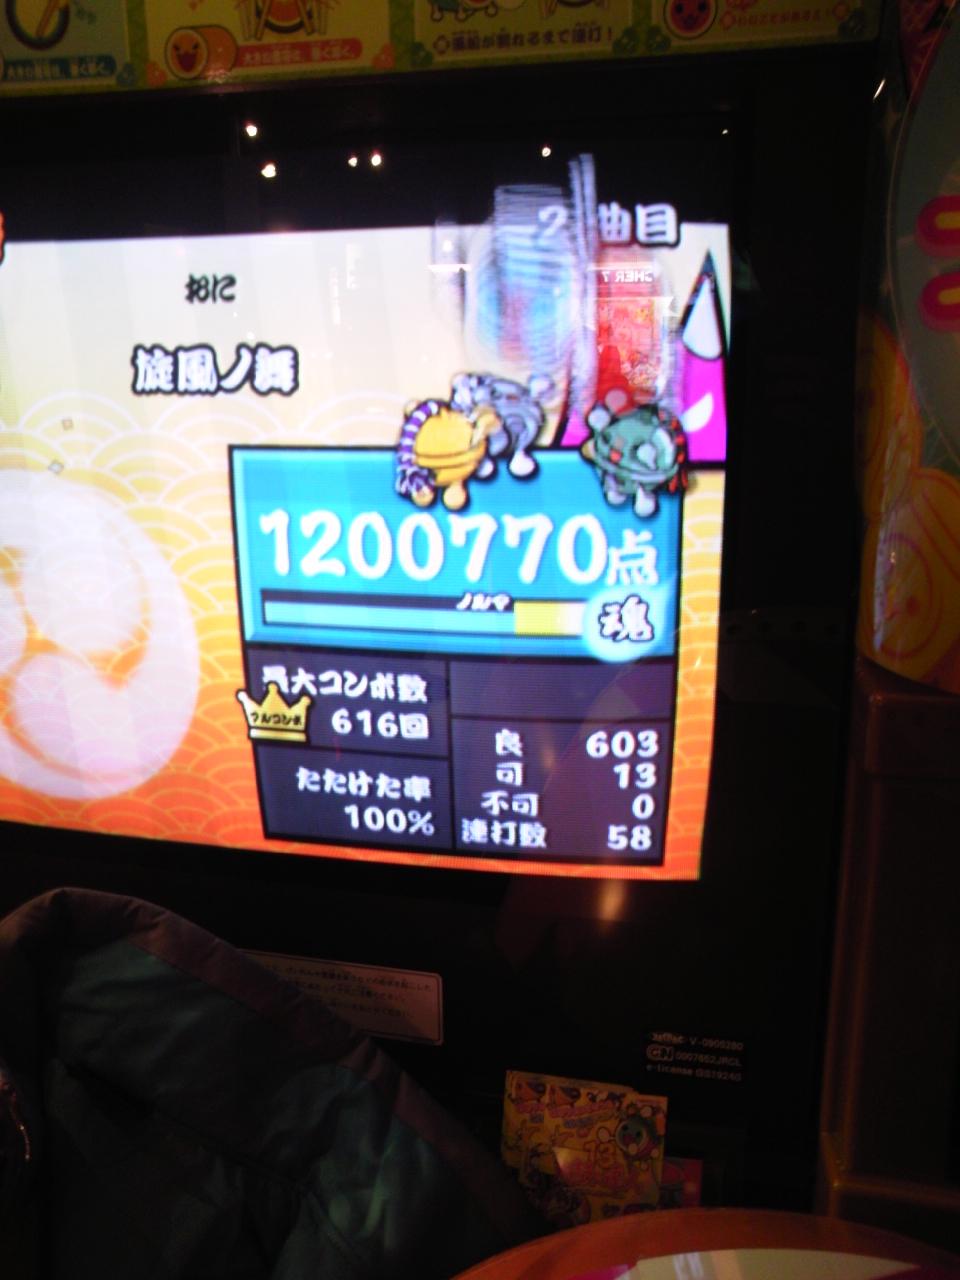 TS3O0069.jpg